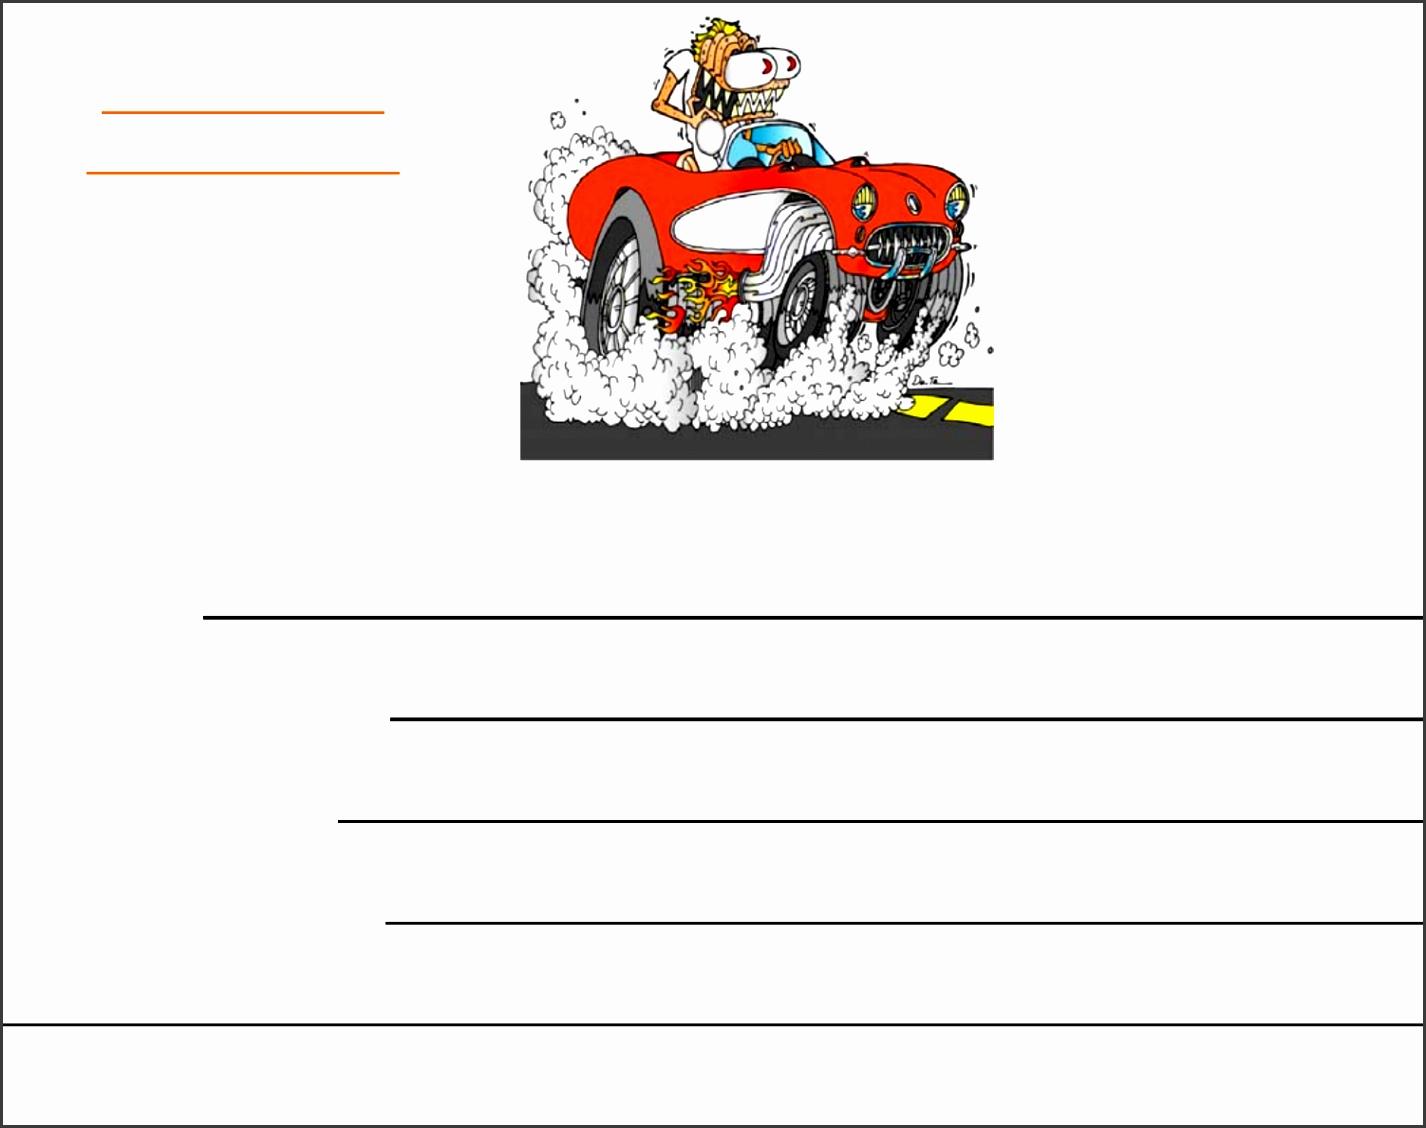 Car Show Registration Form Template Free Download